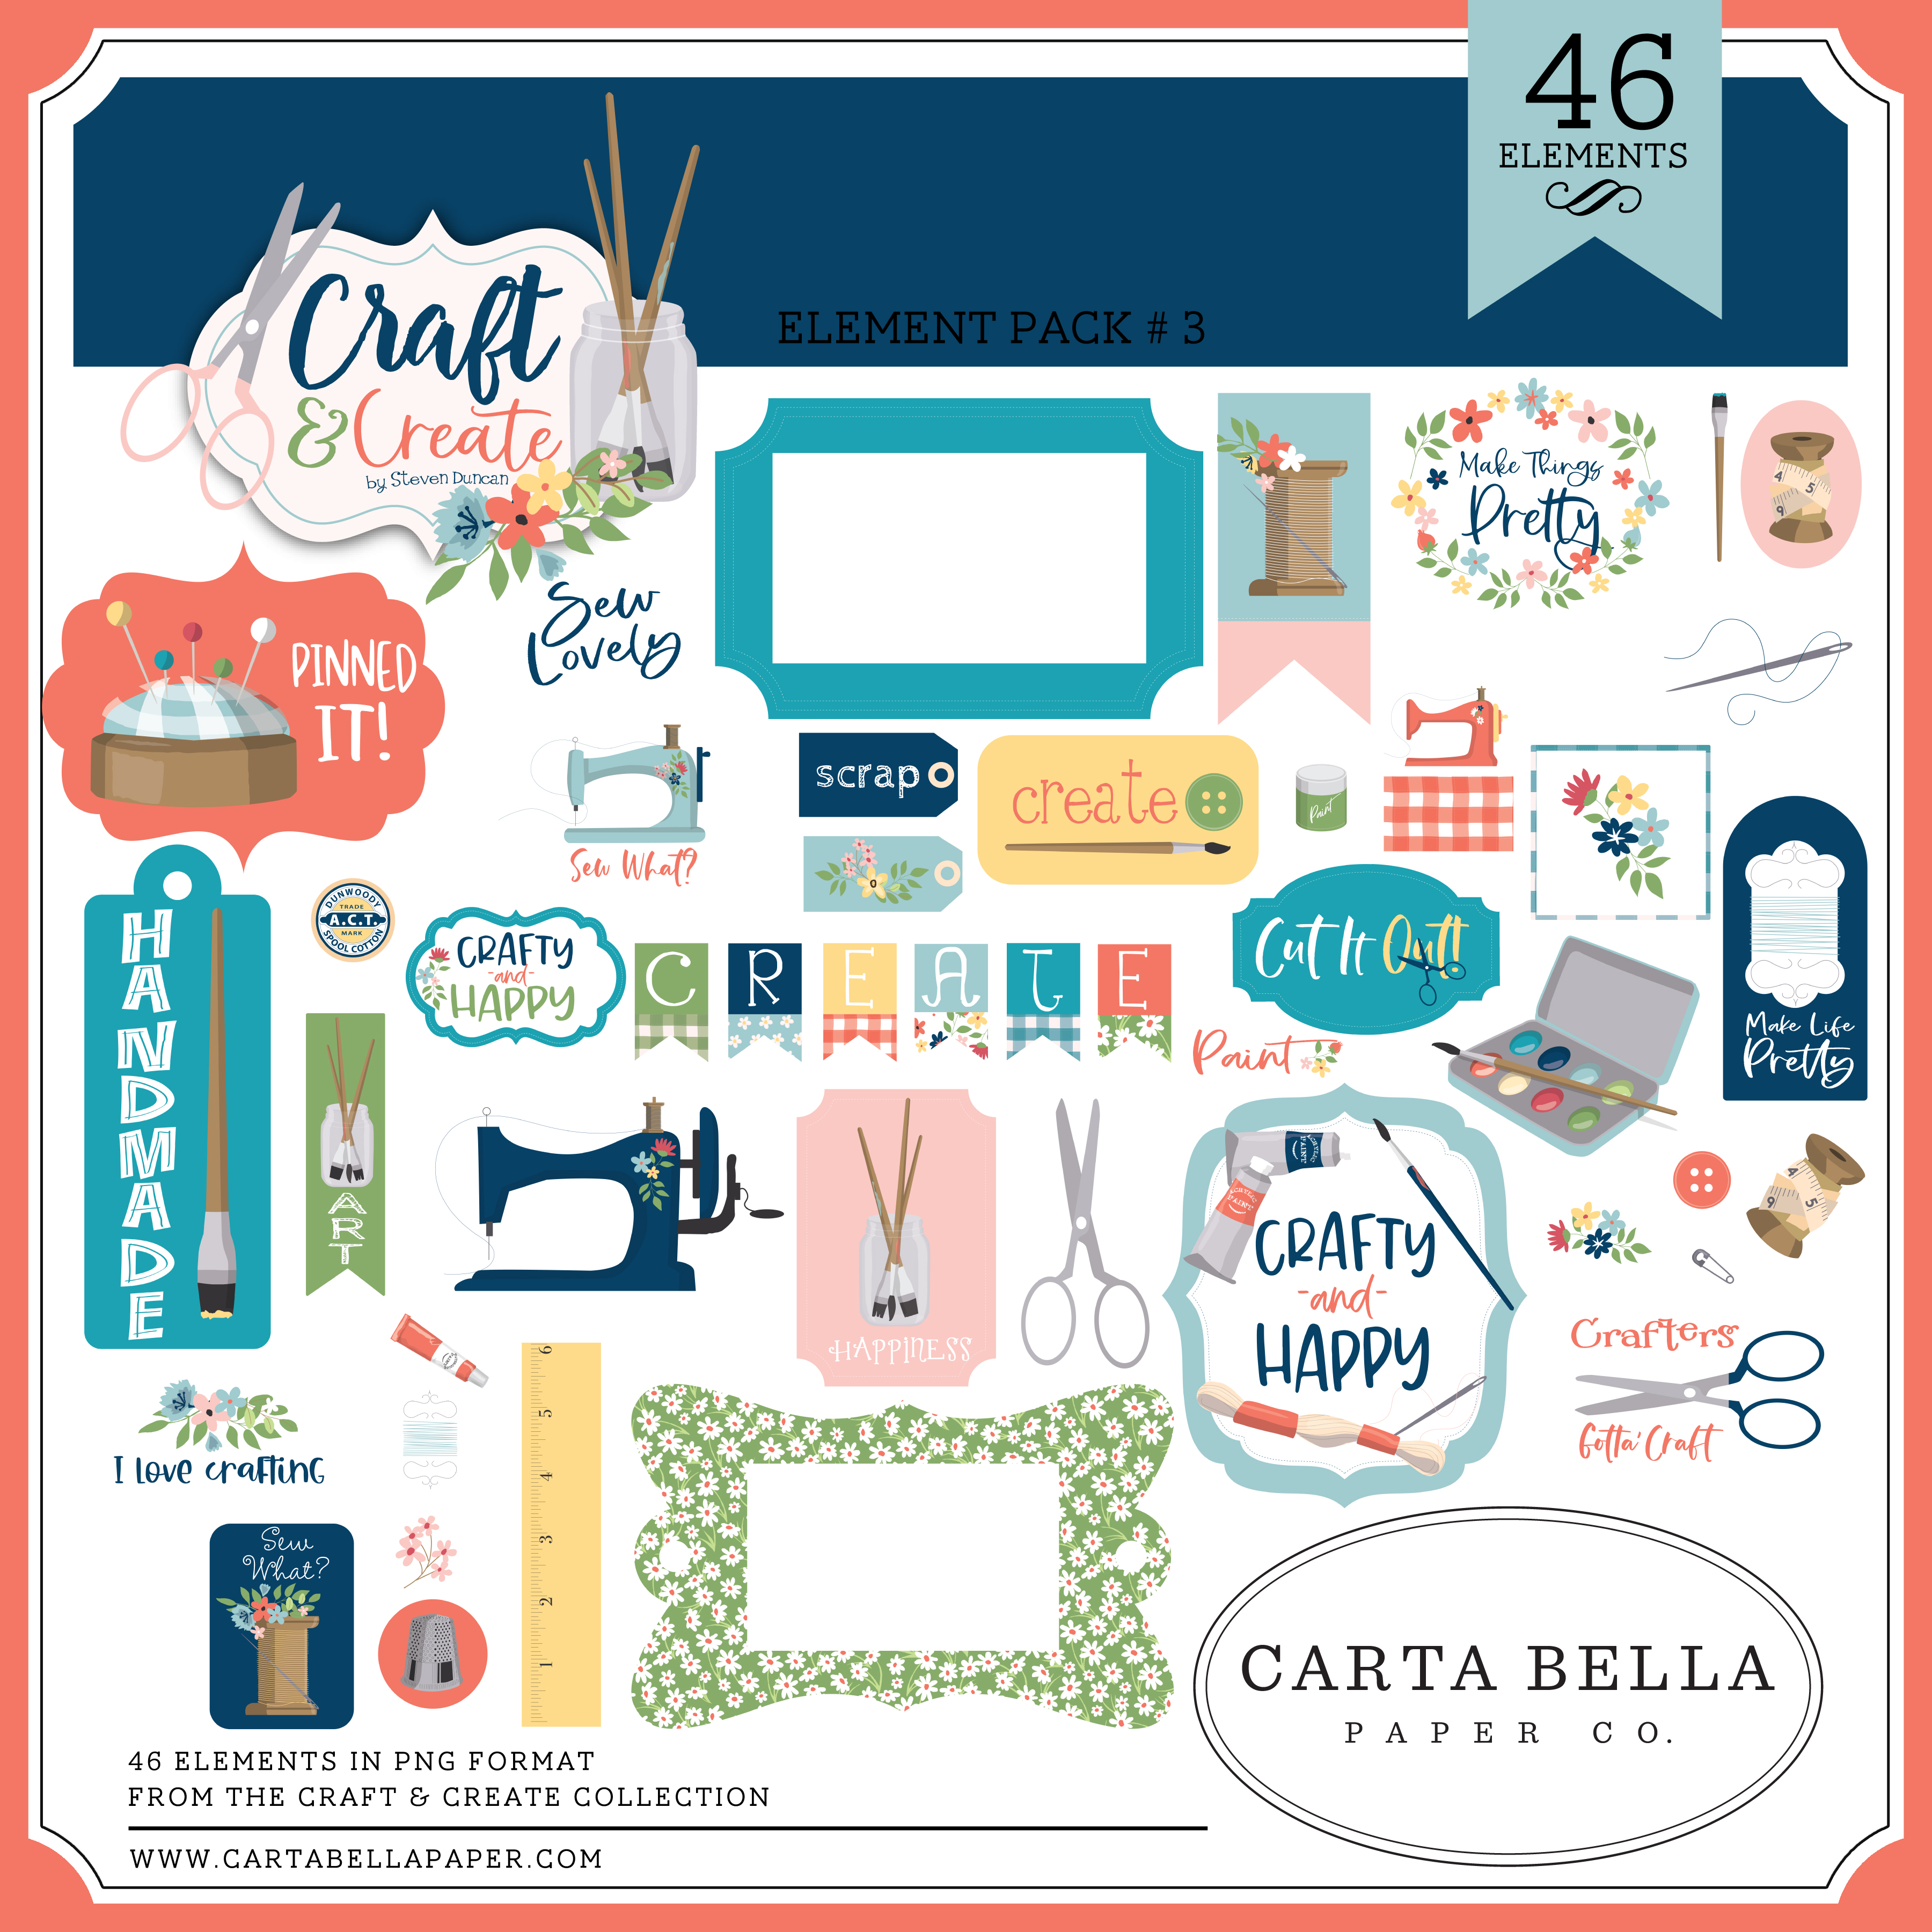 Craft & Create Element Pack #3